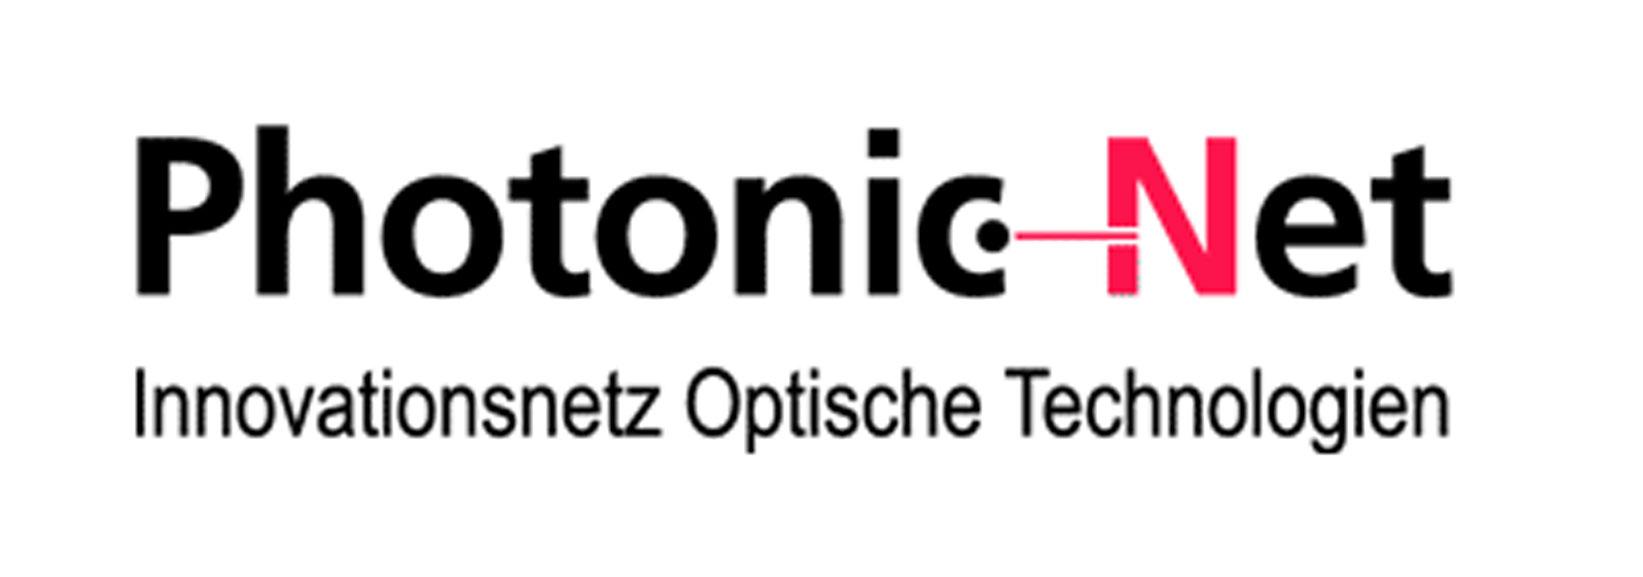 7-photonic